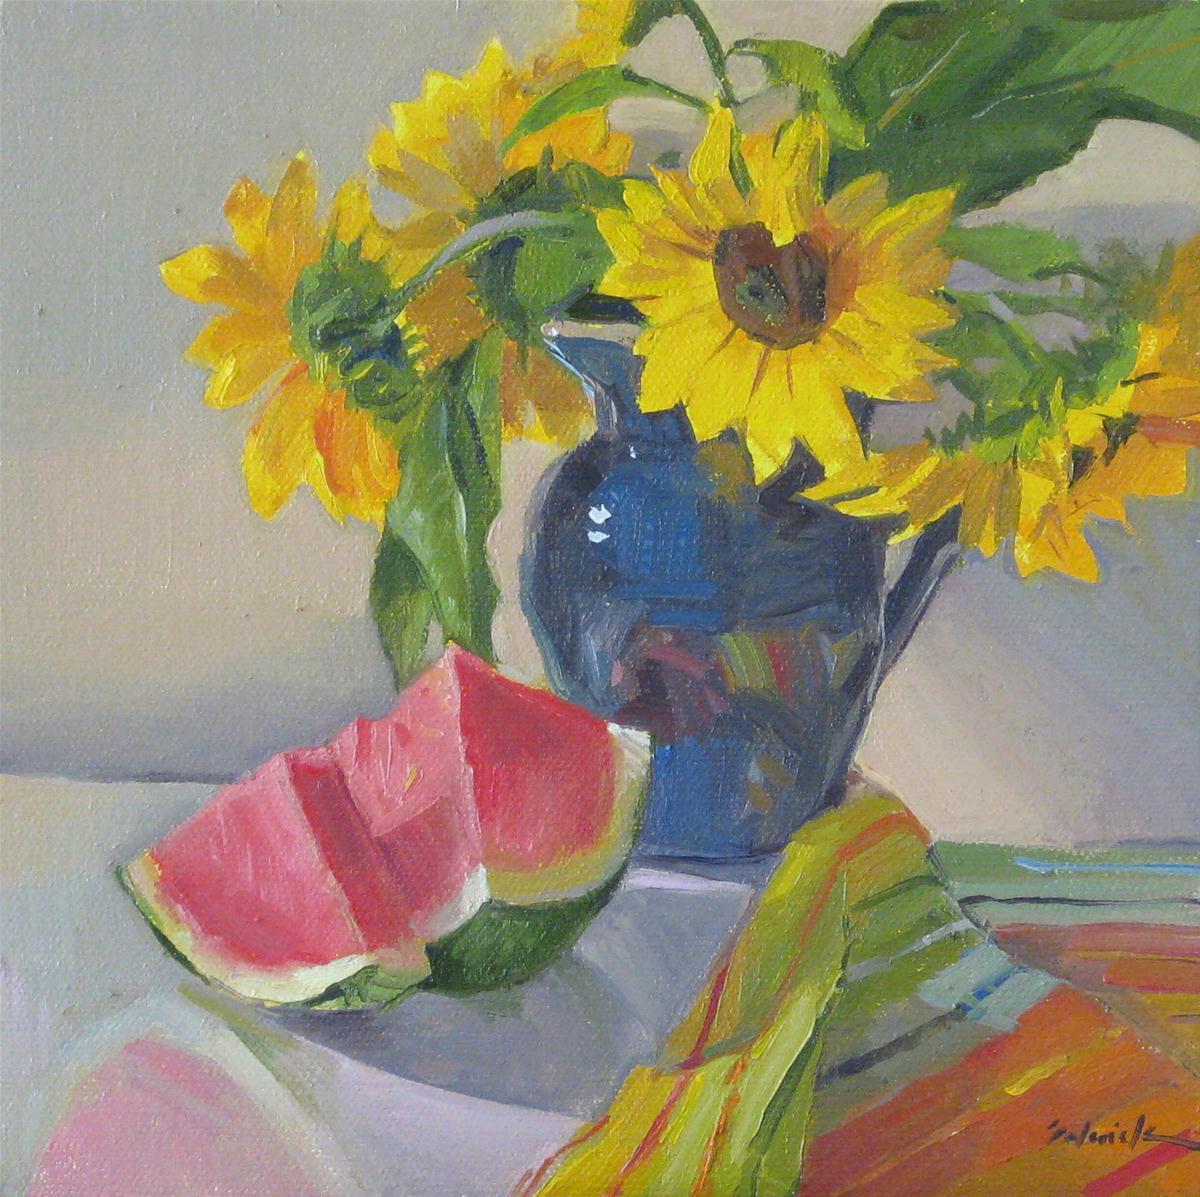 """Sunflowers and Watermelon"" original fine art by Sarah Sedwick"